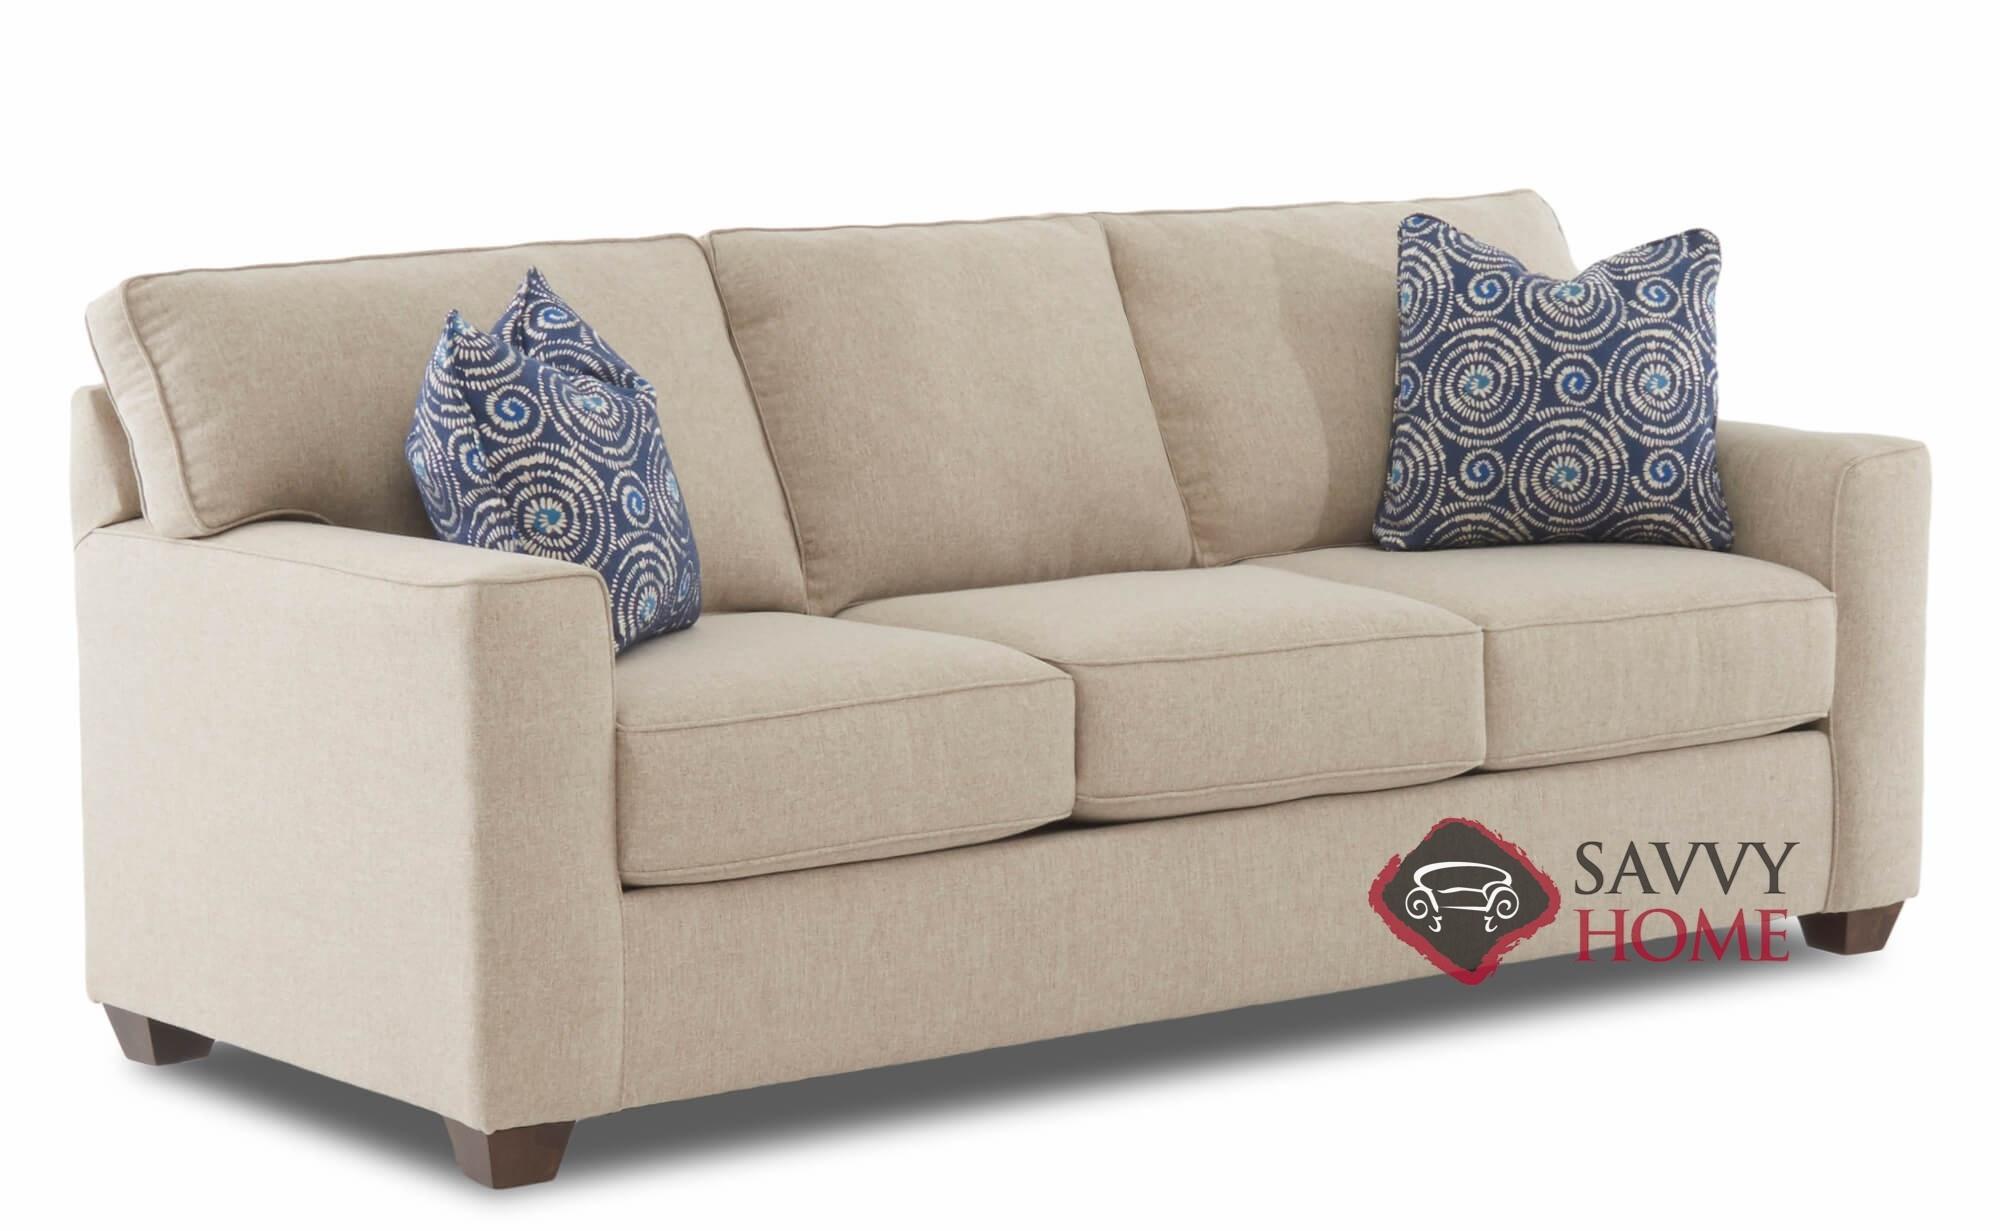 Newbury By Savvy Fabric Sleeper Sofas